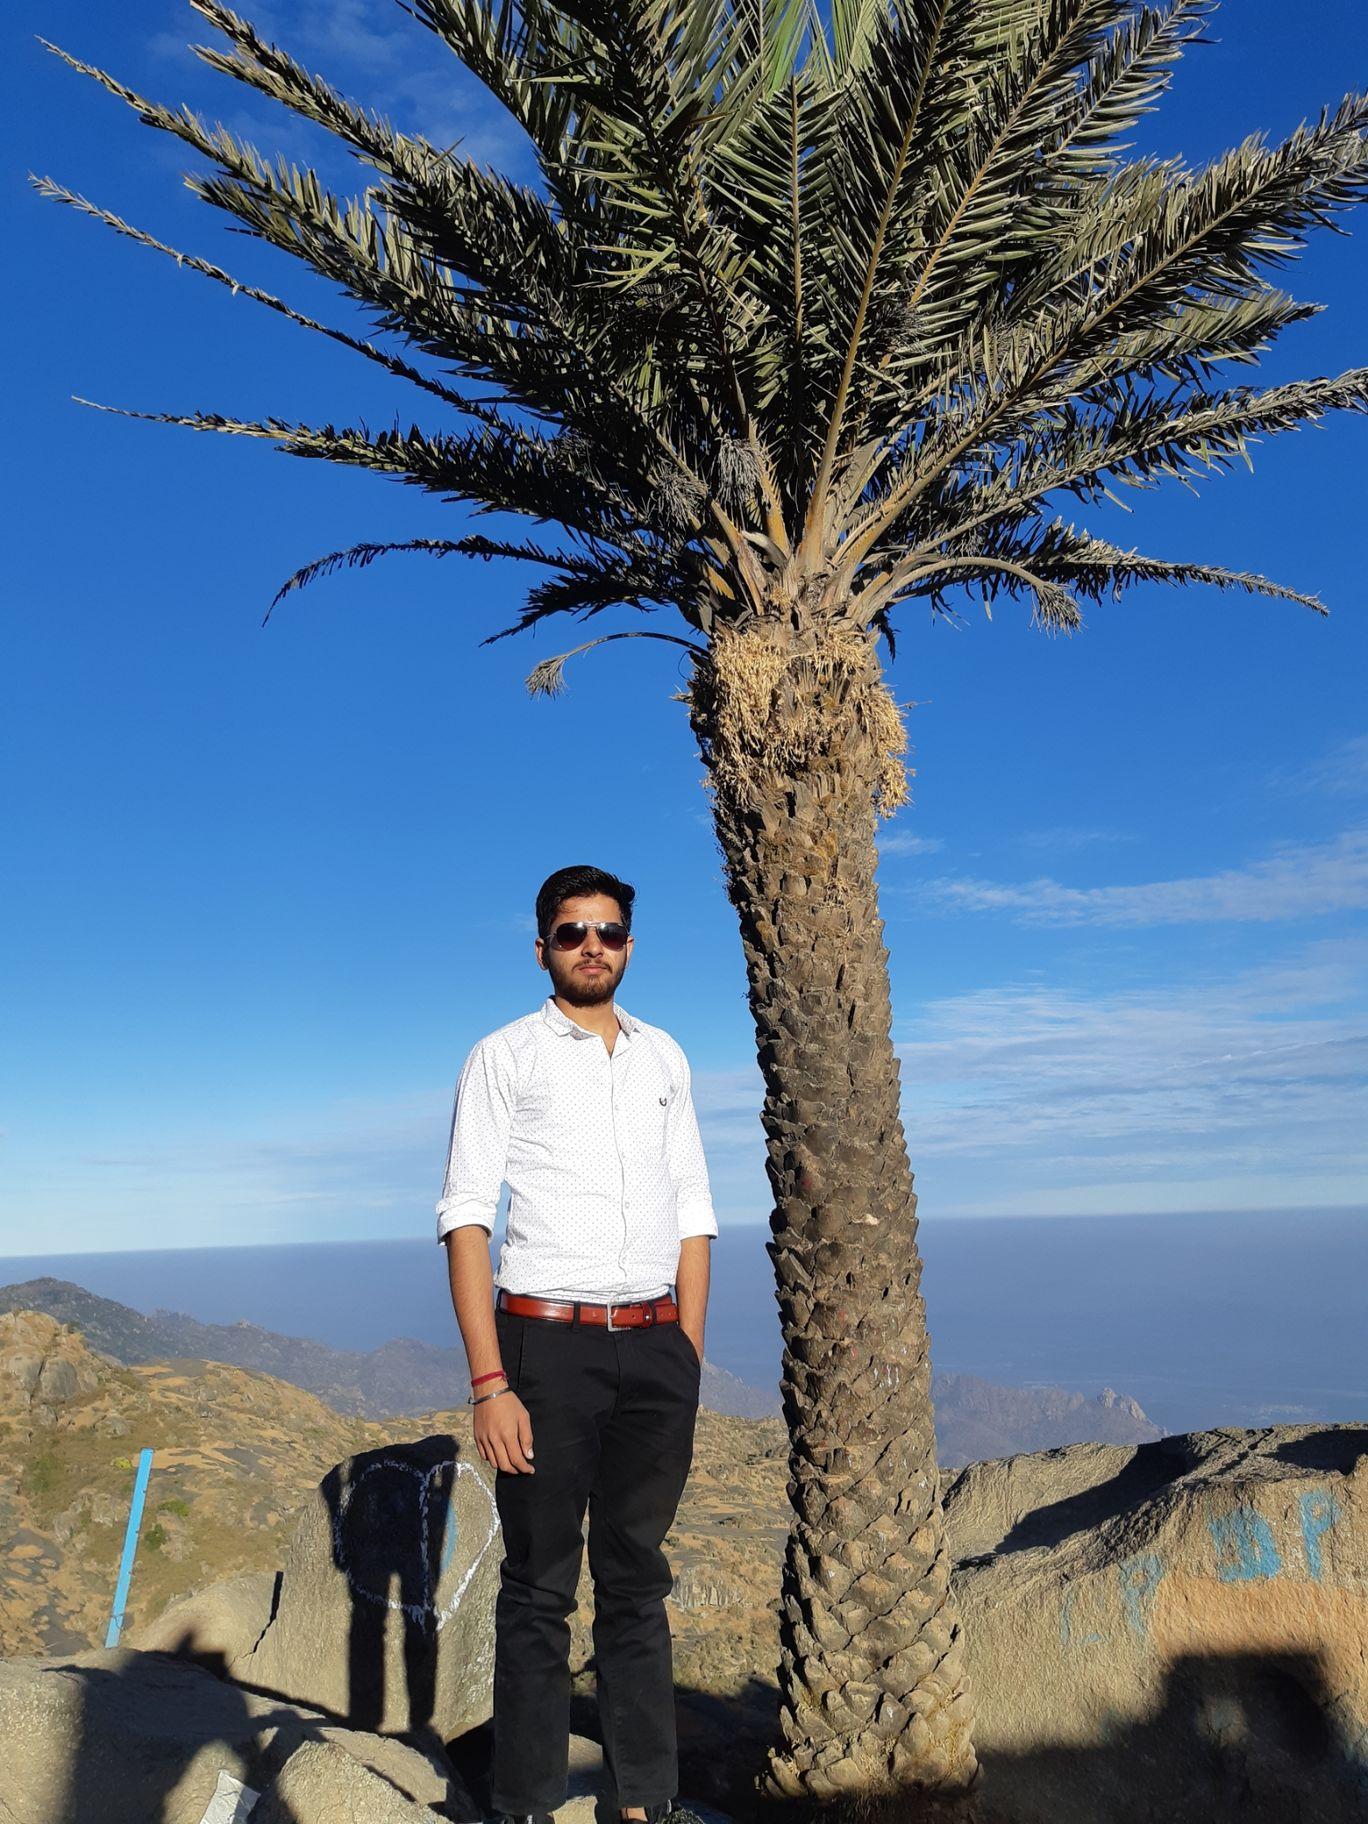 Photo of Mount Abu By Pradhyuman Singh Rathore